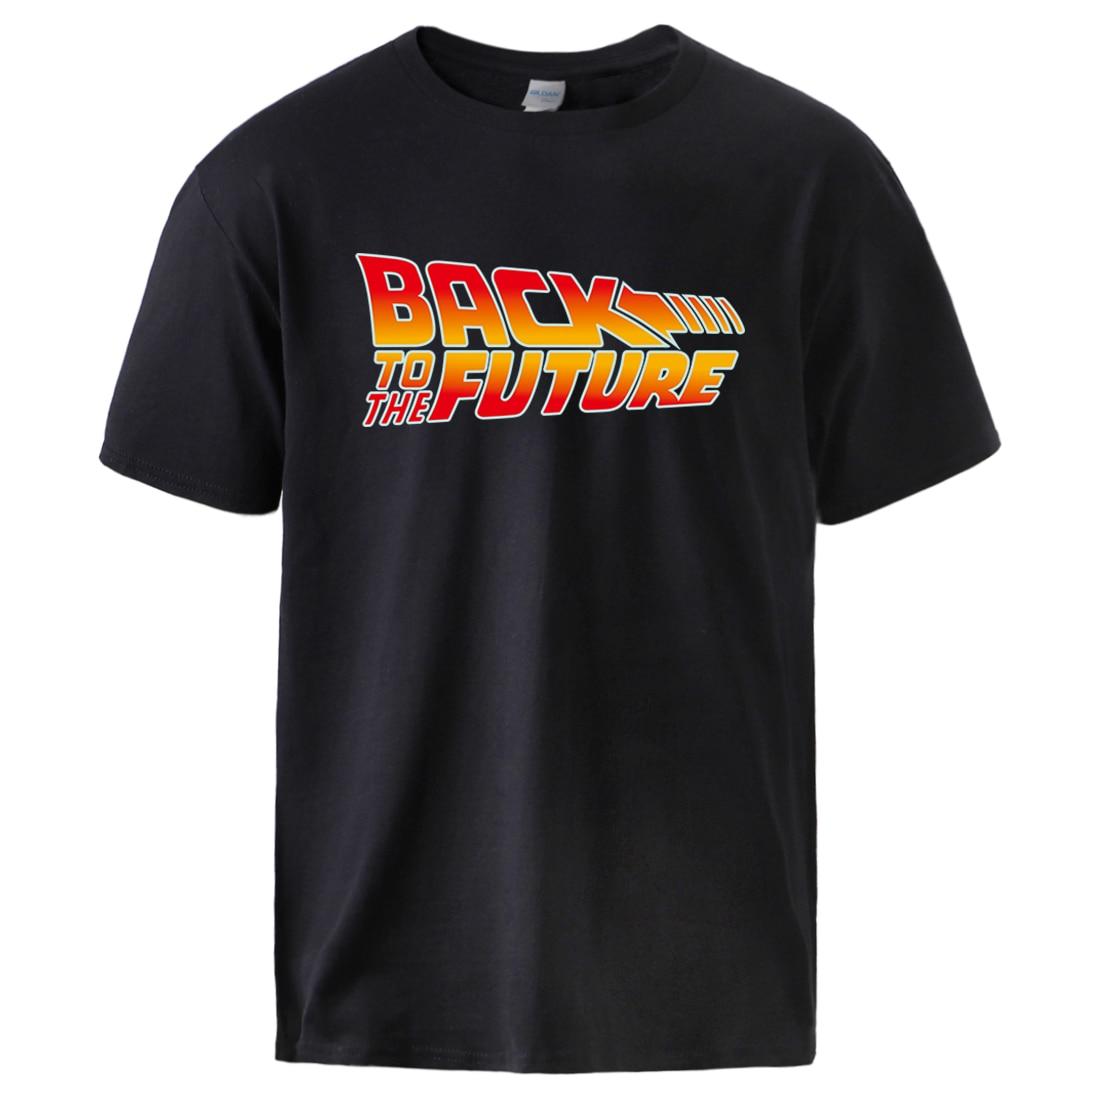 Back To The Future Print Mens T Shirts 2020 Summer High Quality Cotton Tshirts Man Hot Sell Brand Hip Hop Fashion Sportswear Top